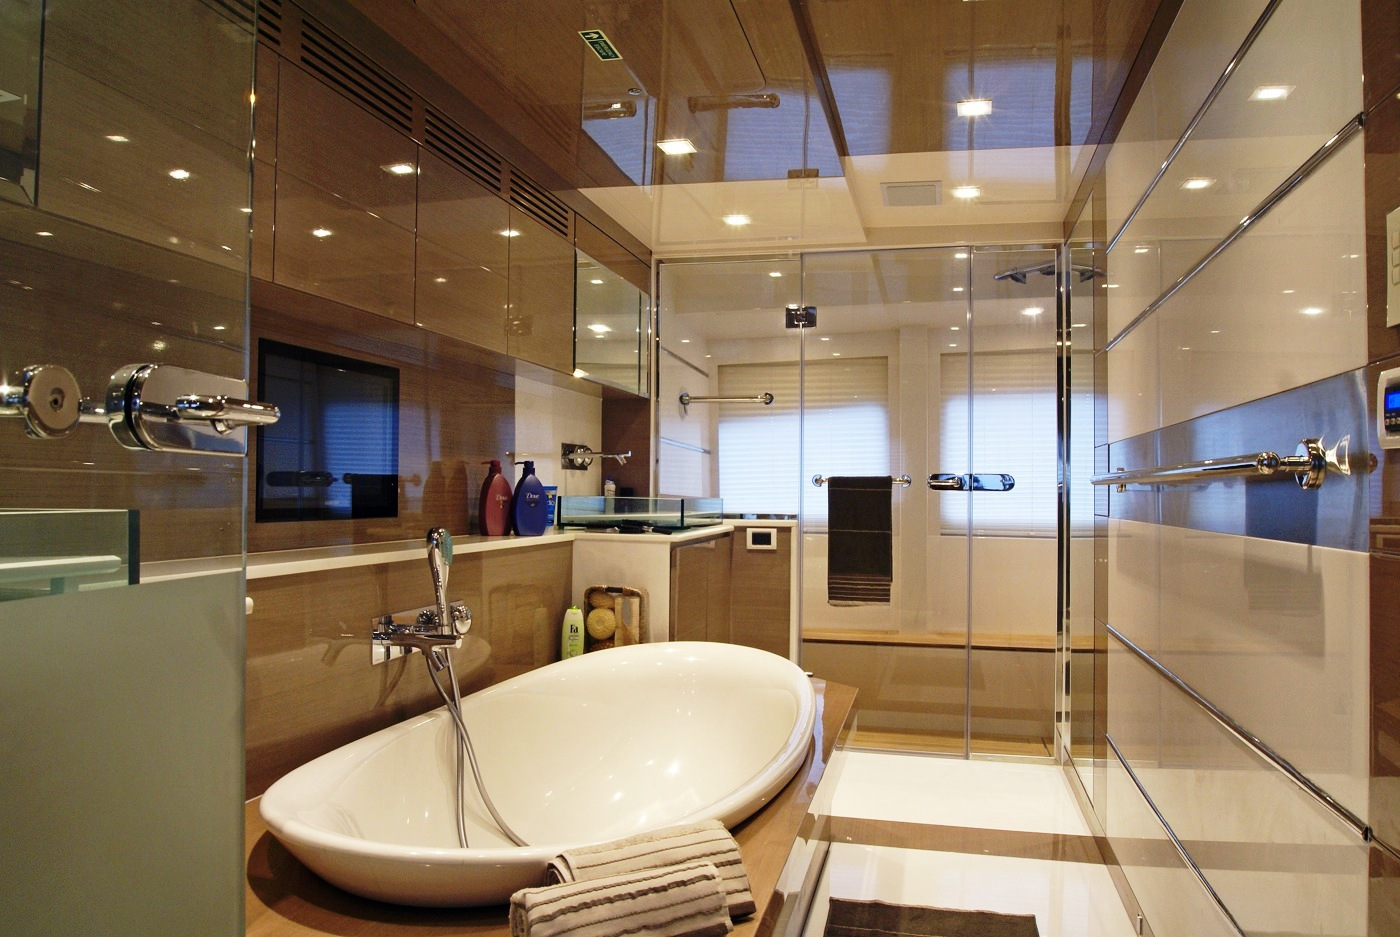 Телевизор для ванной комнаты дарим себе комфорт класса люкс